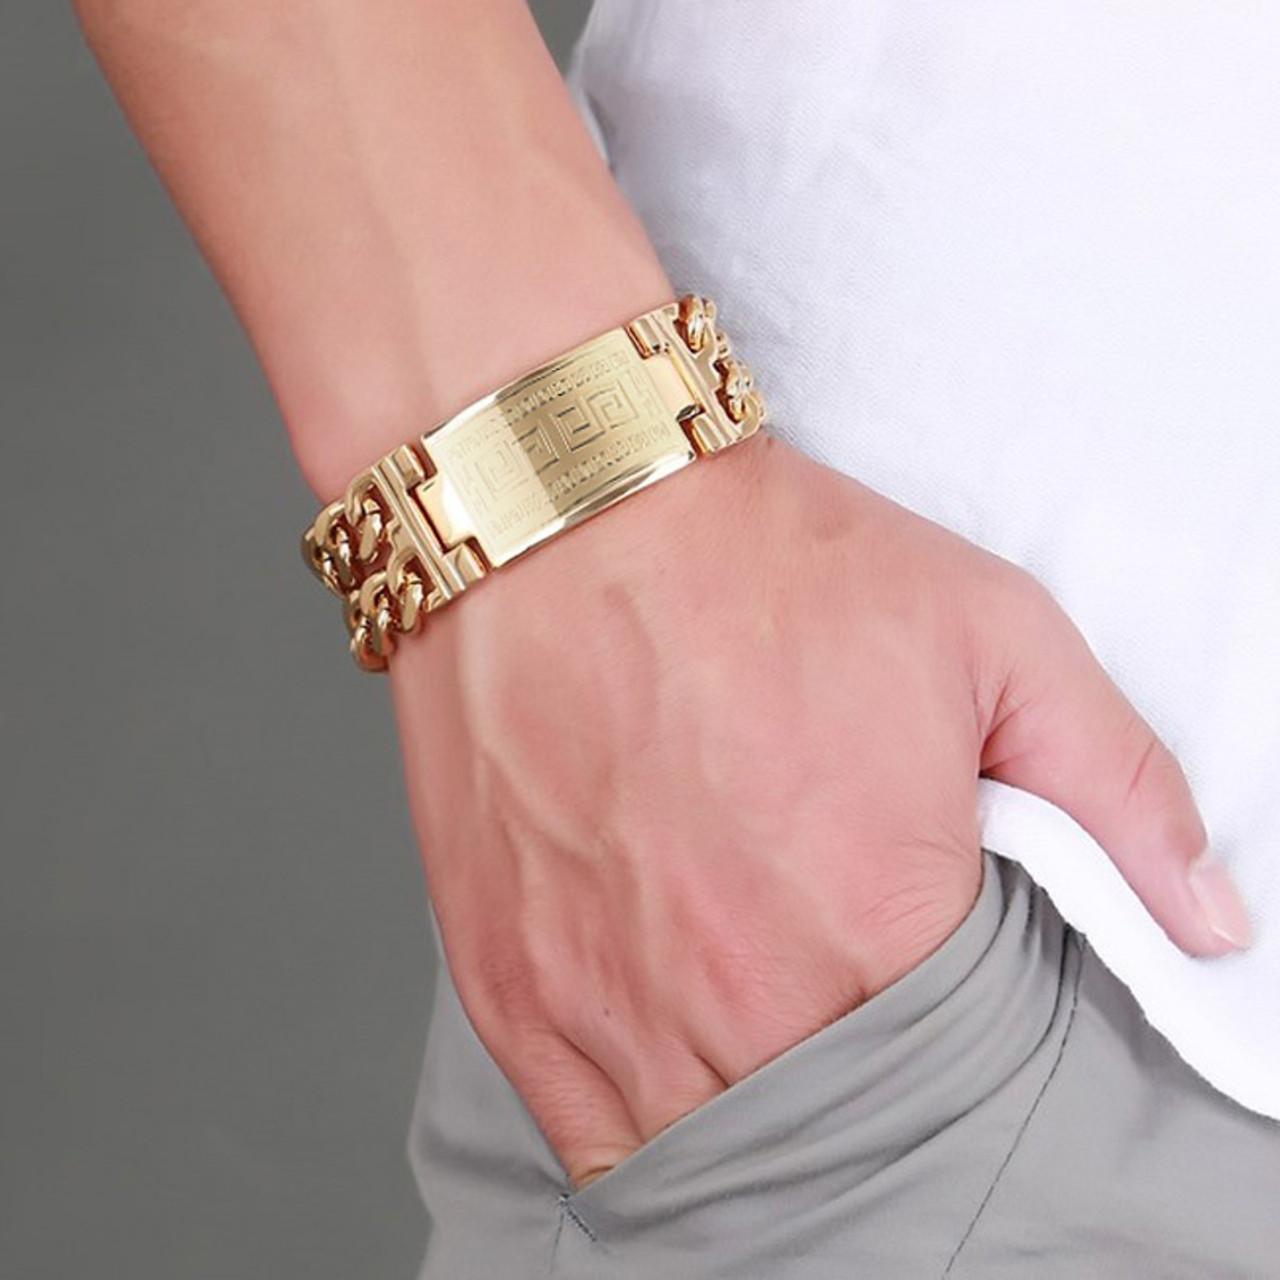 f4cbc0d496c270 ... Men's Greece Key ID Tag Bracelet for Men Stainless Steel Male Double  Cuba Chain Bangles Bileklik ...